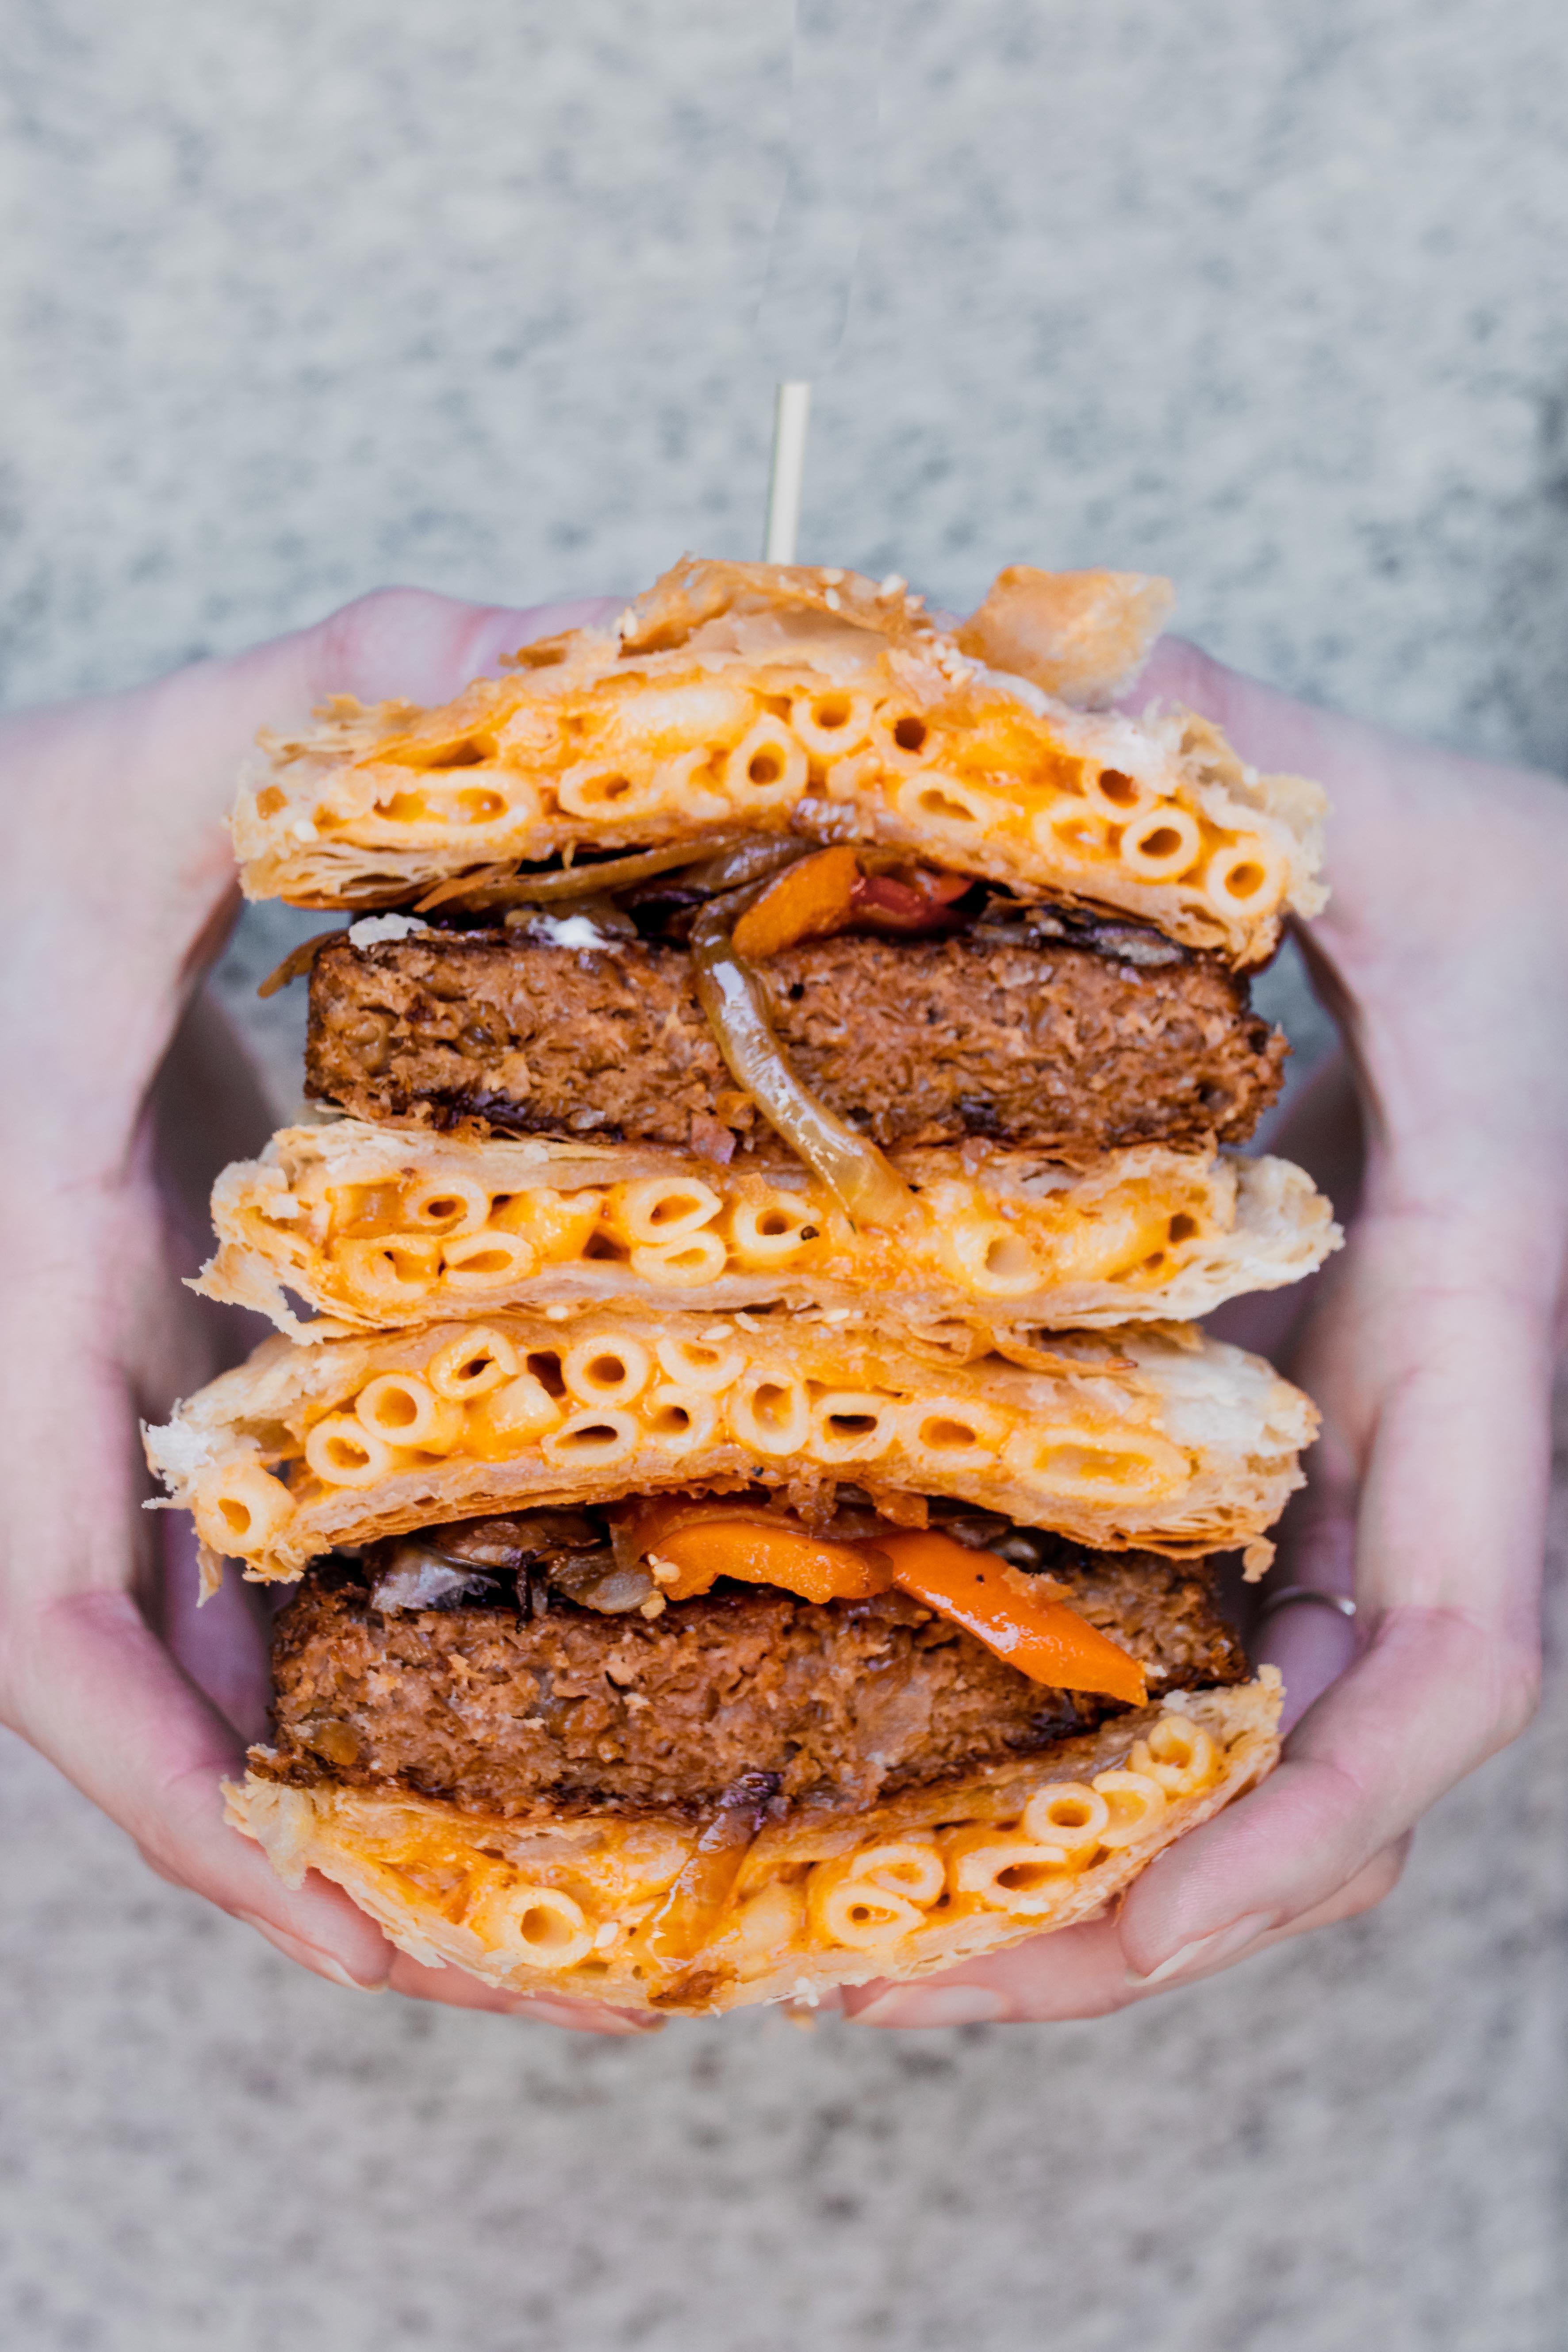 buffalo mac n' cheese burger being held